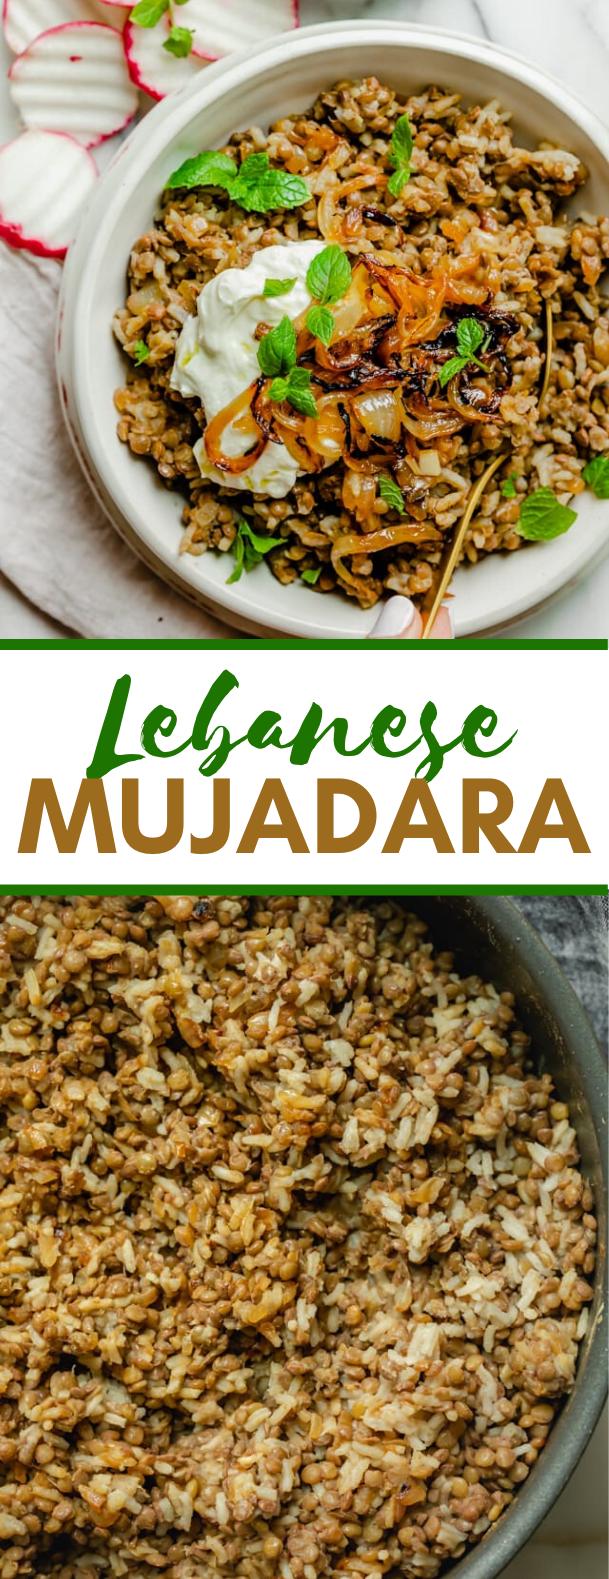 Lebanese Mujadara #dinner #vegan